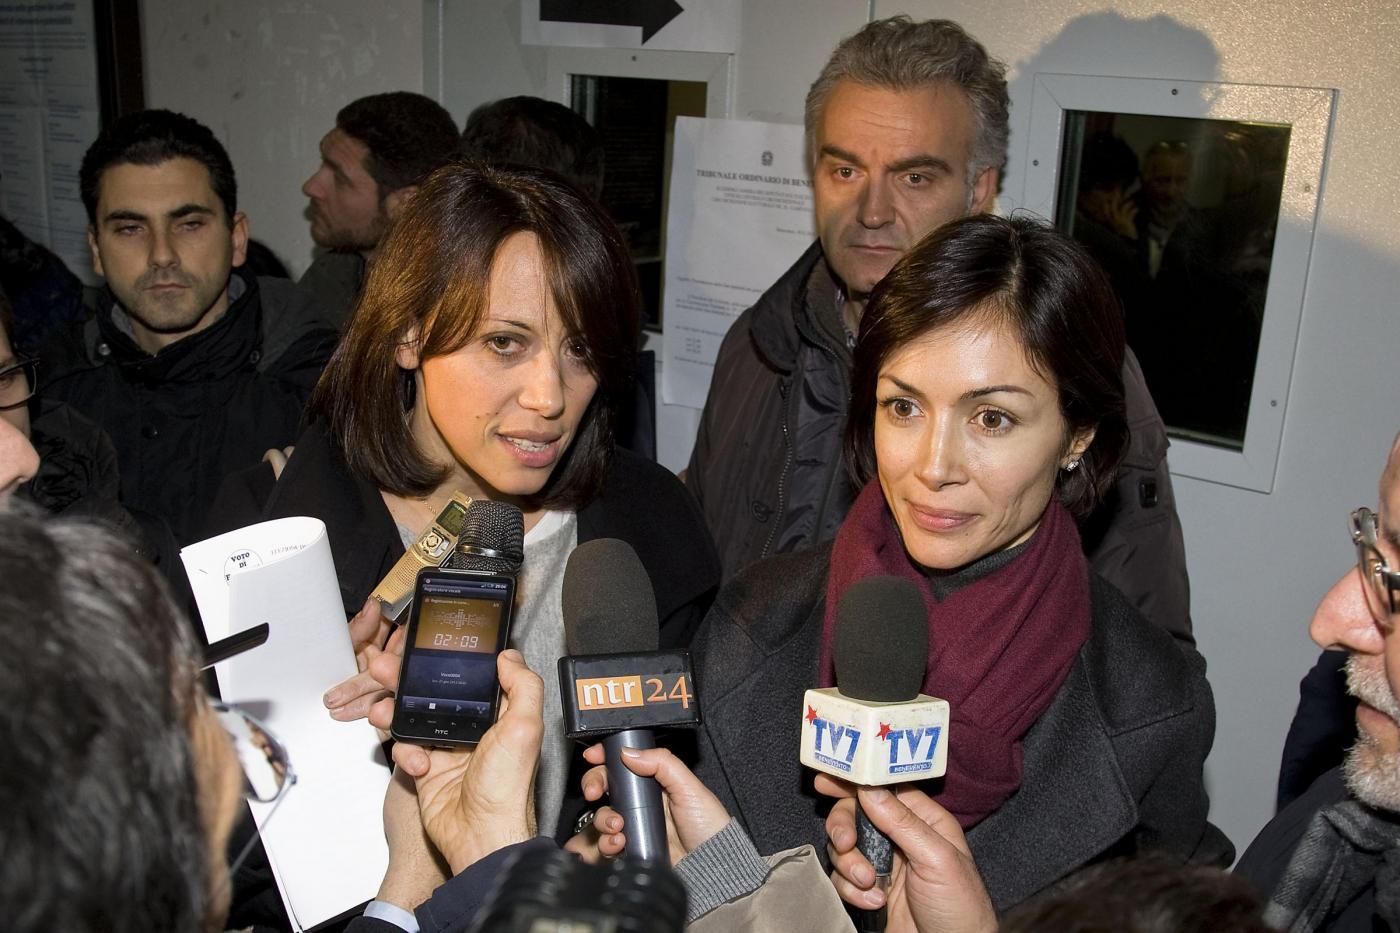 De Girolamo e Carfagna in Tribunale a Benevento per lista Pdl 02